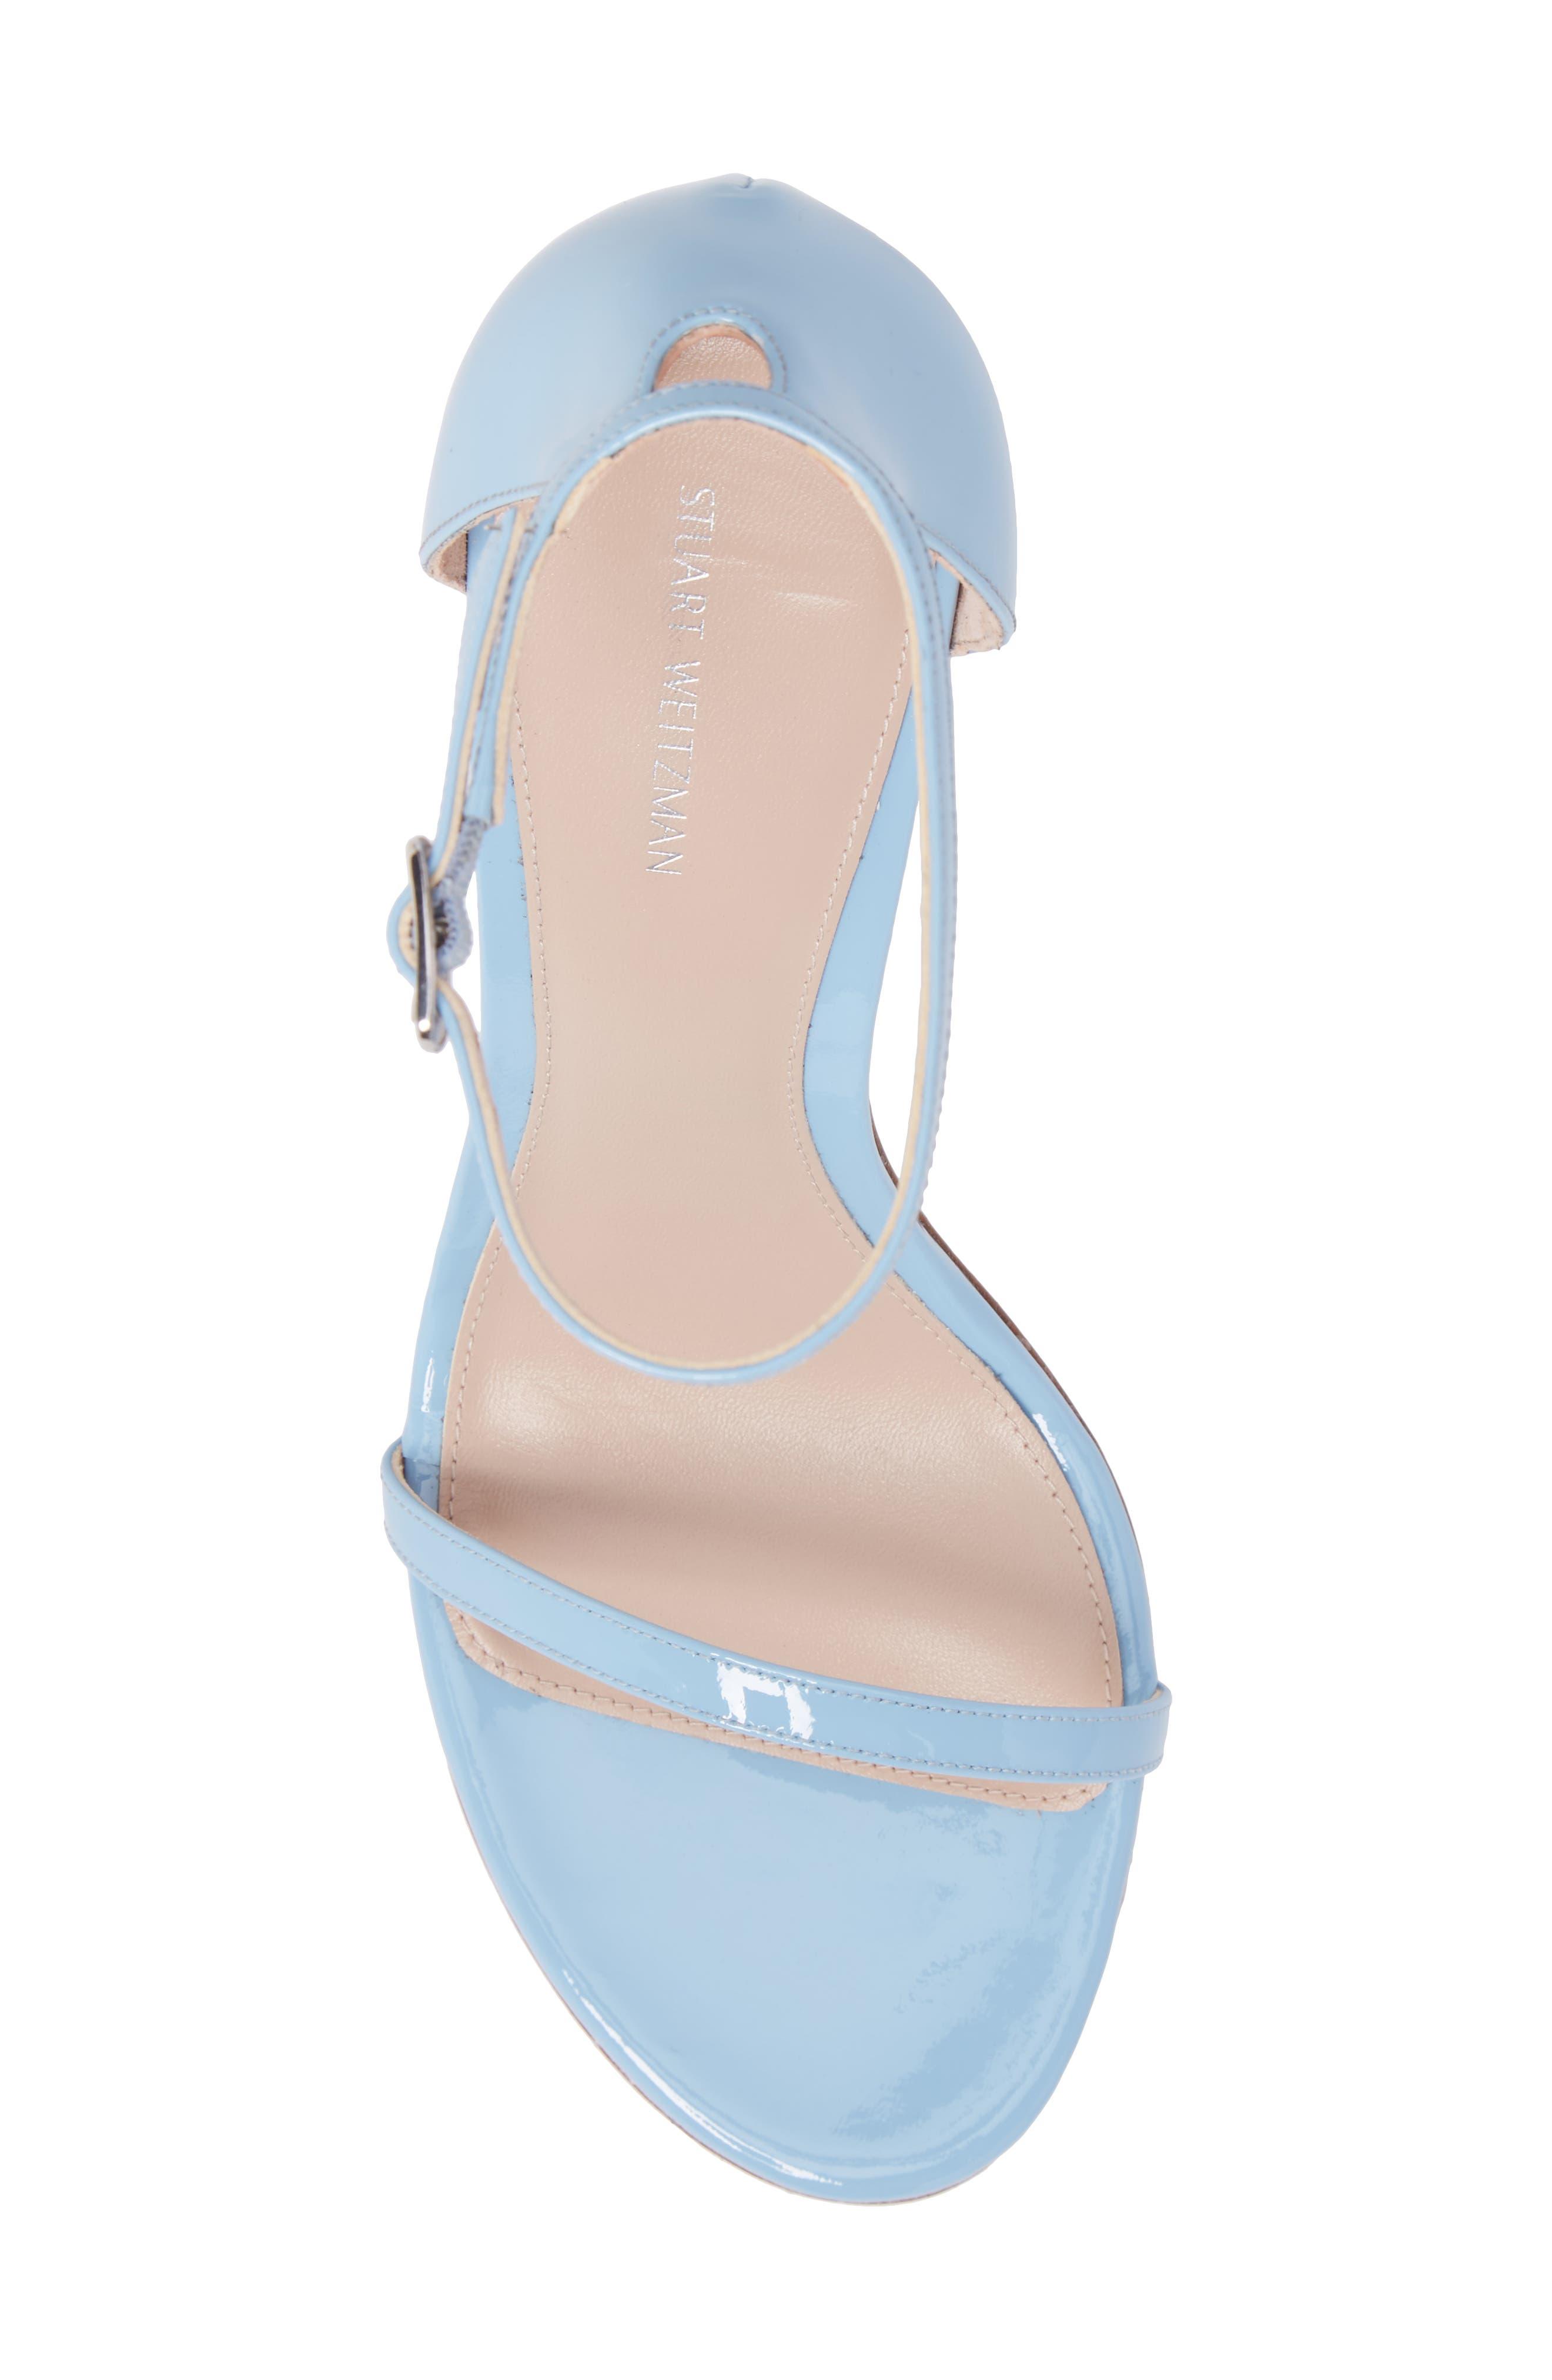 Nudistsong Ankle Strap Sandal,                             Alternate thumbnail 176, color,